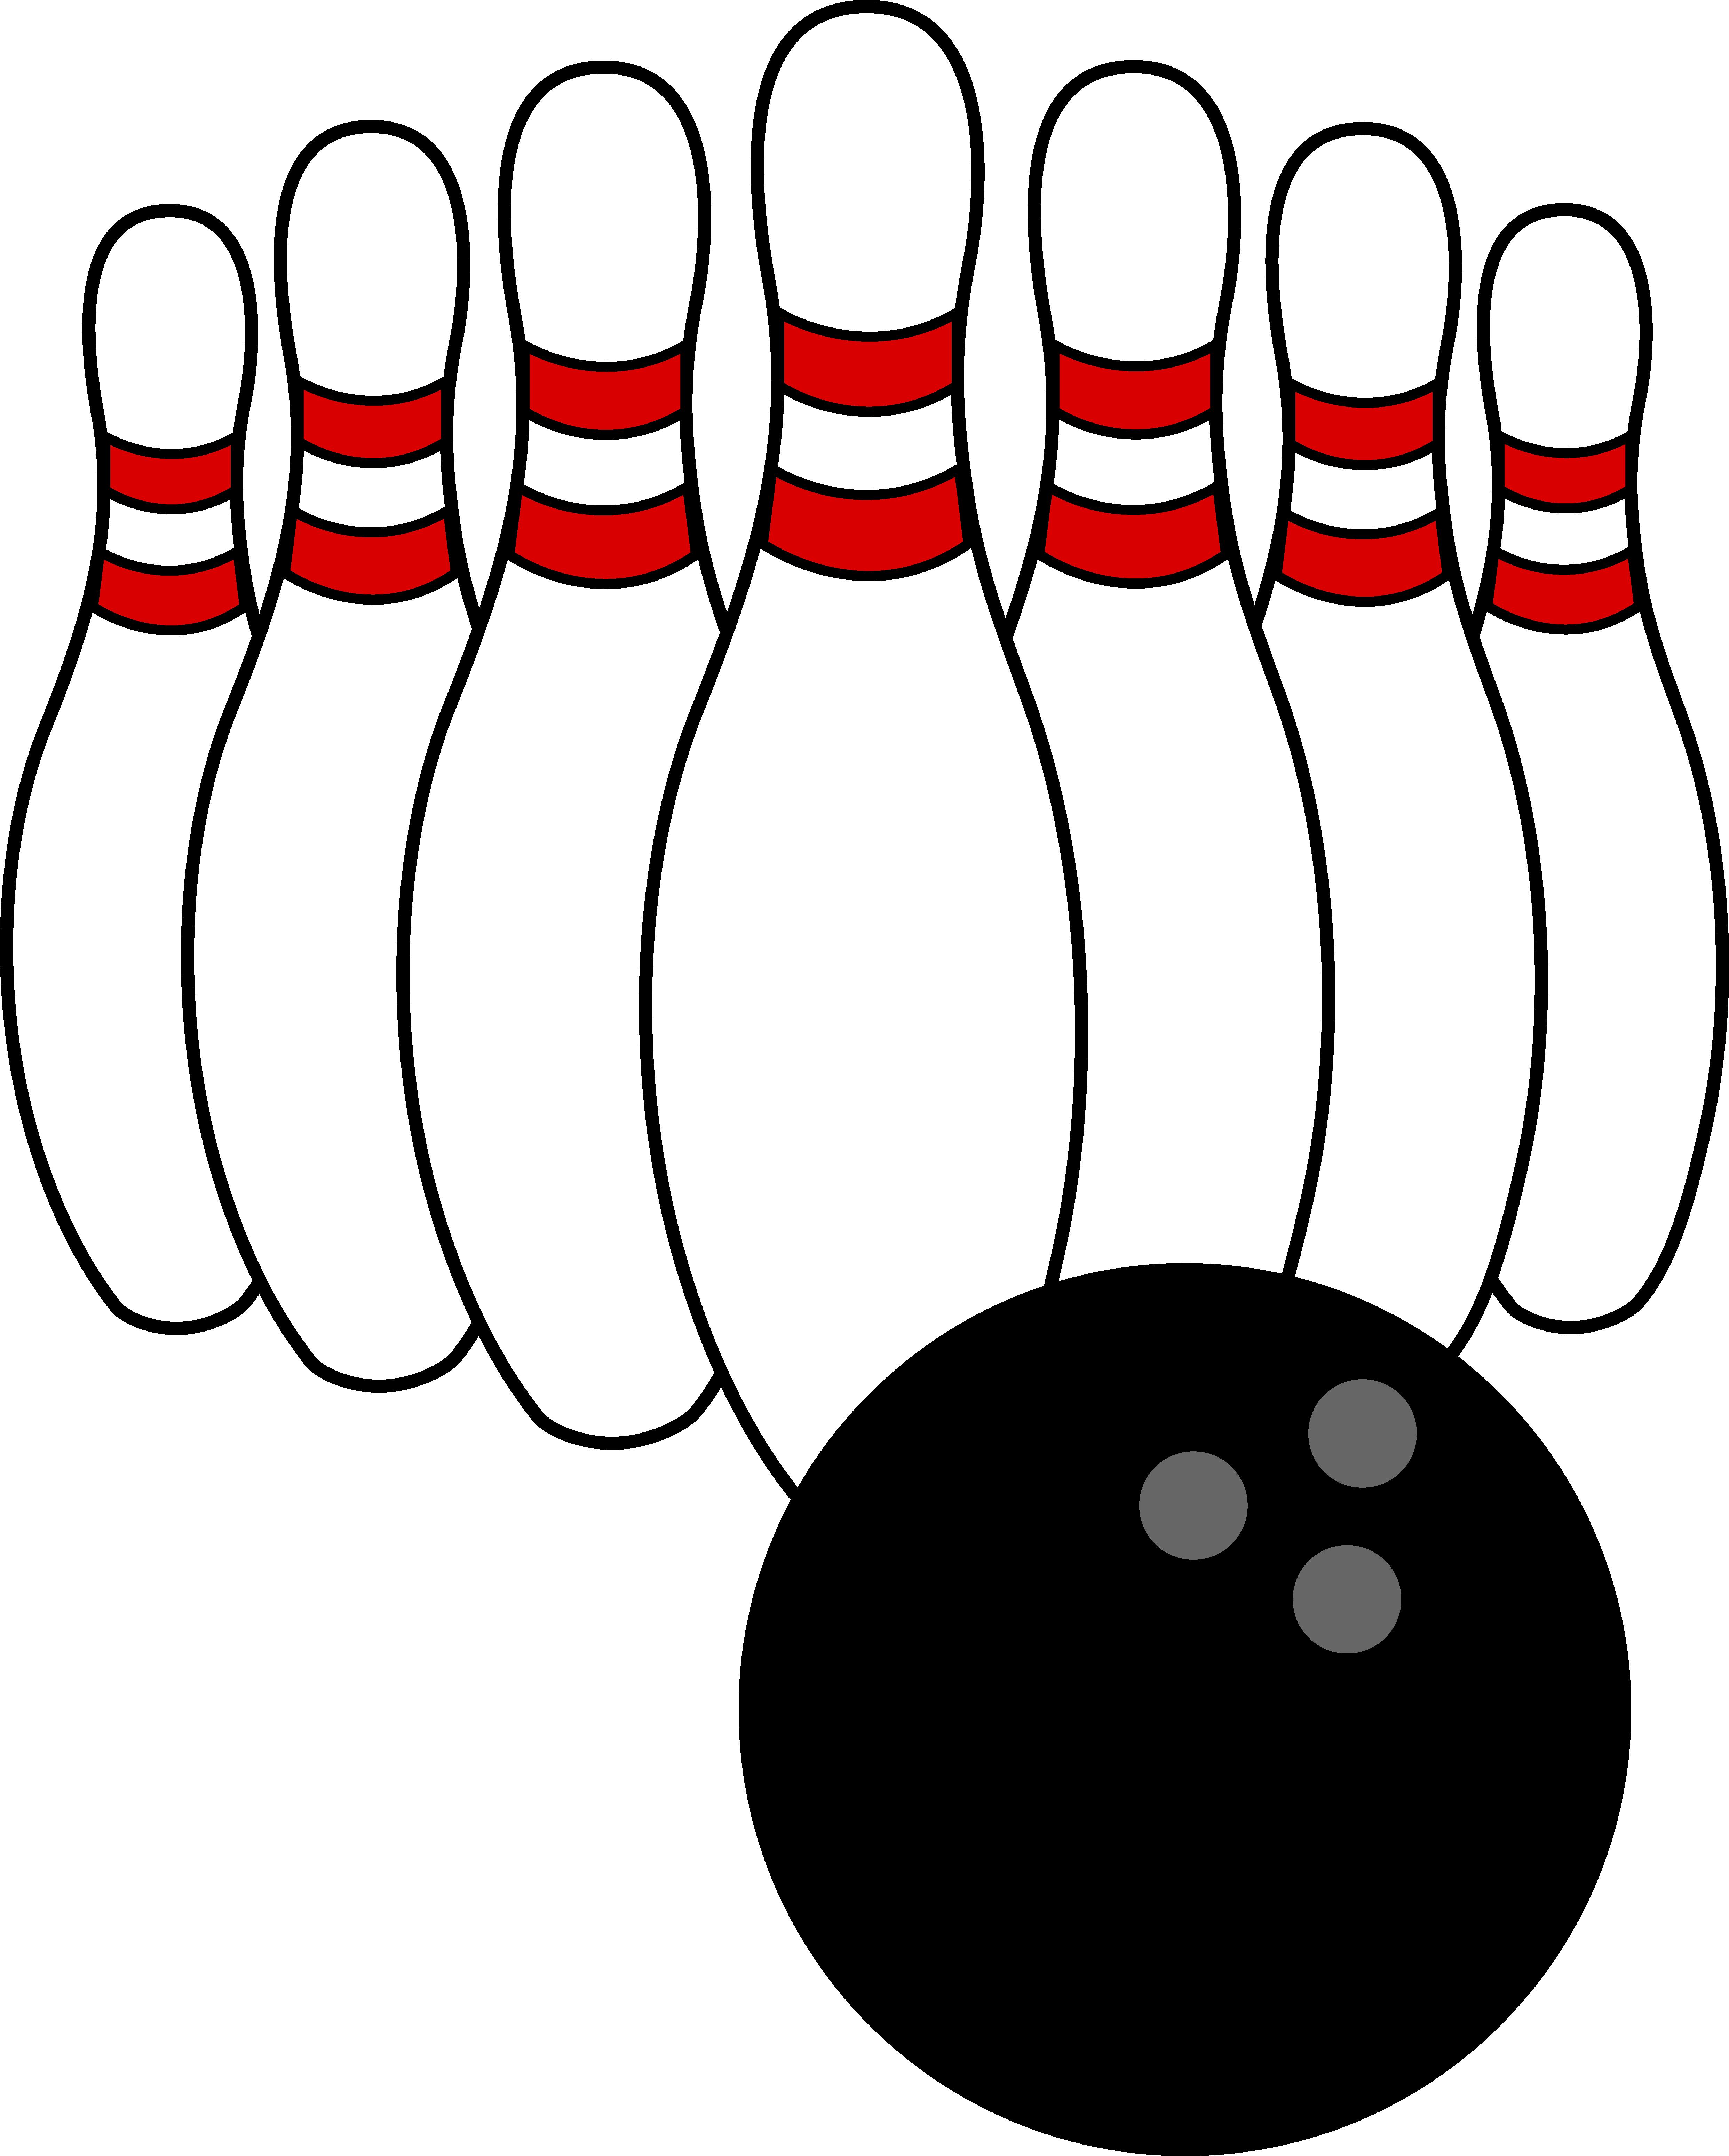 Bowling Clip Art | Bowling Ball and Pins